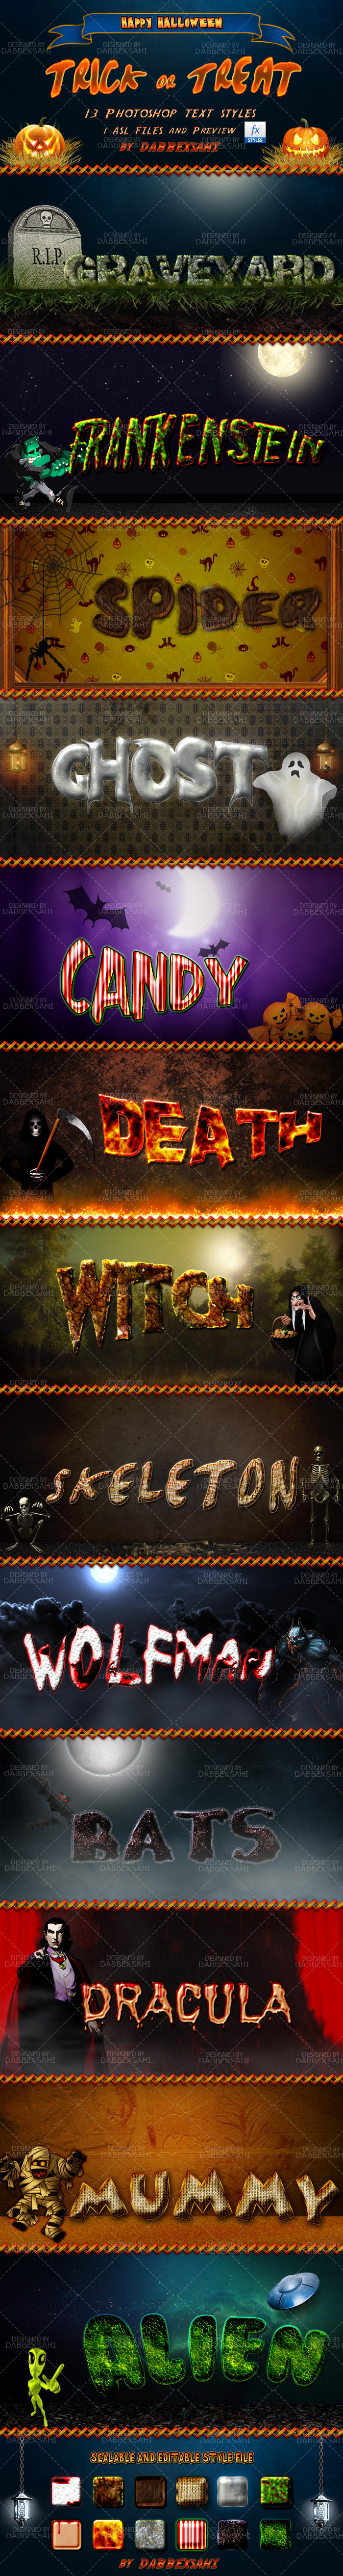 http://fc07.deviantart.net/fs71/i/2012/290/2/f/halloween_text_effects_by_dabbexsahi_by_dabbex30-d5i3x79.jpg